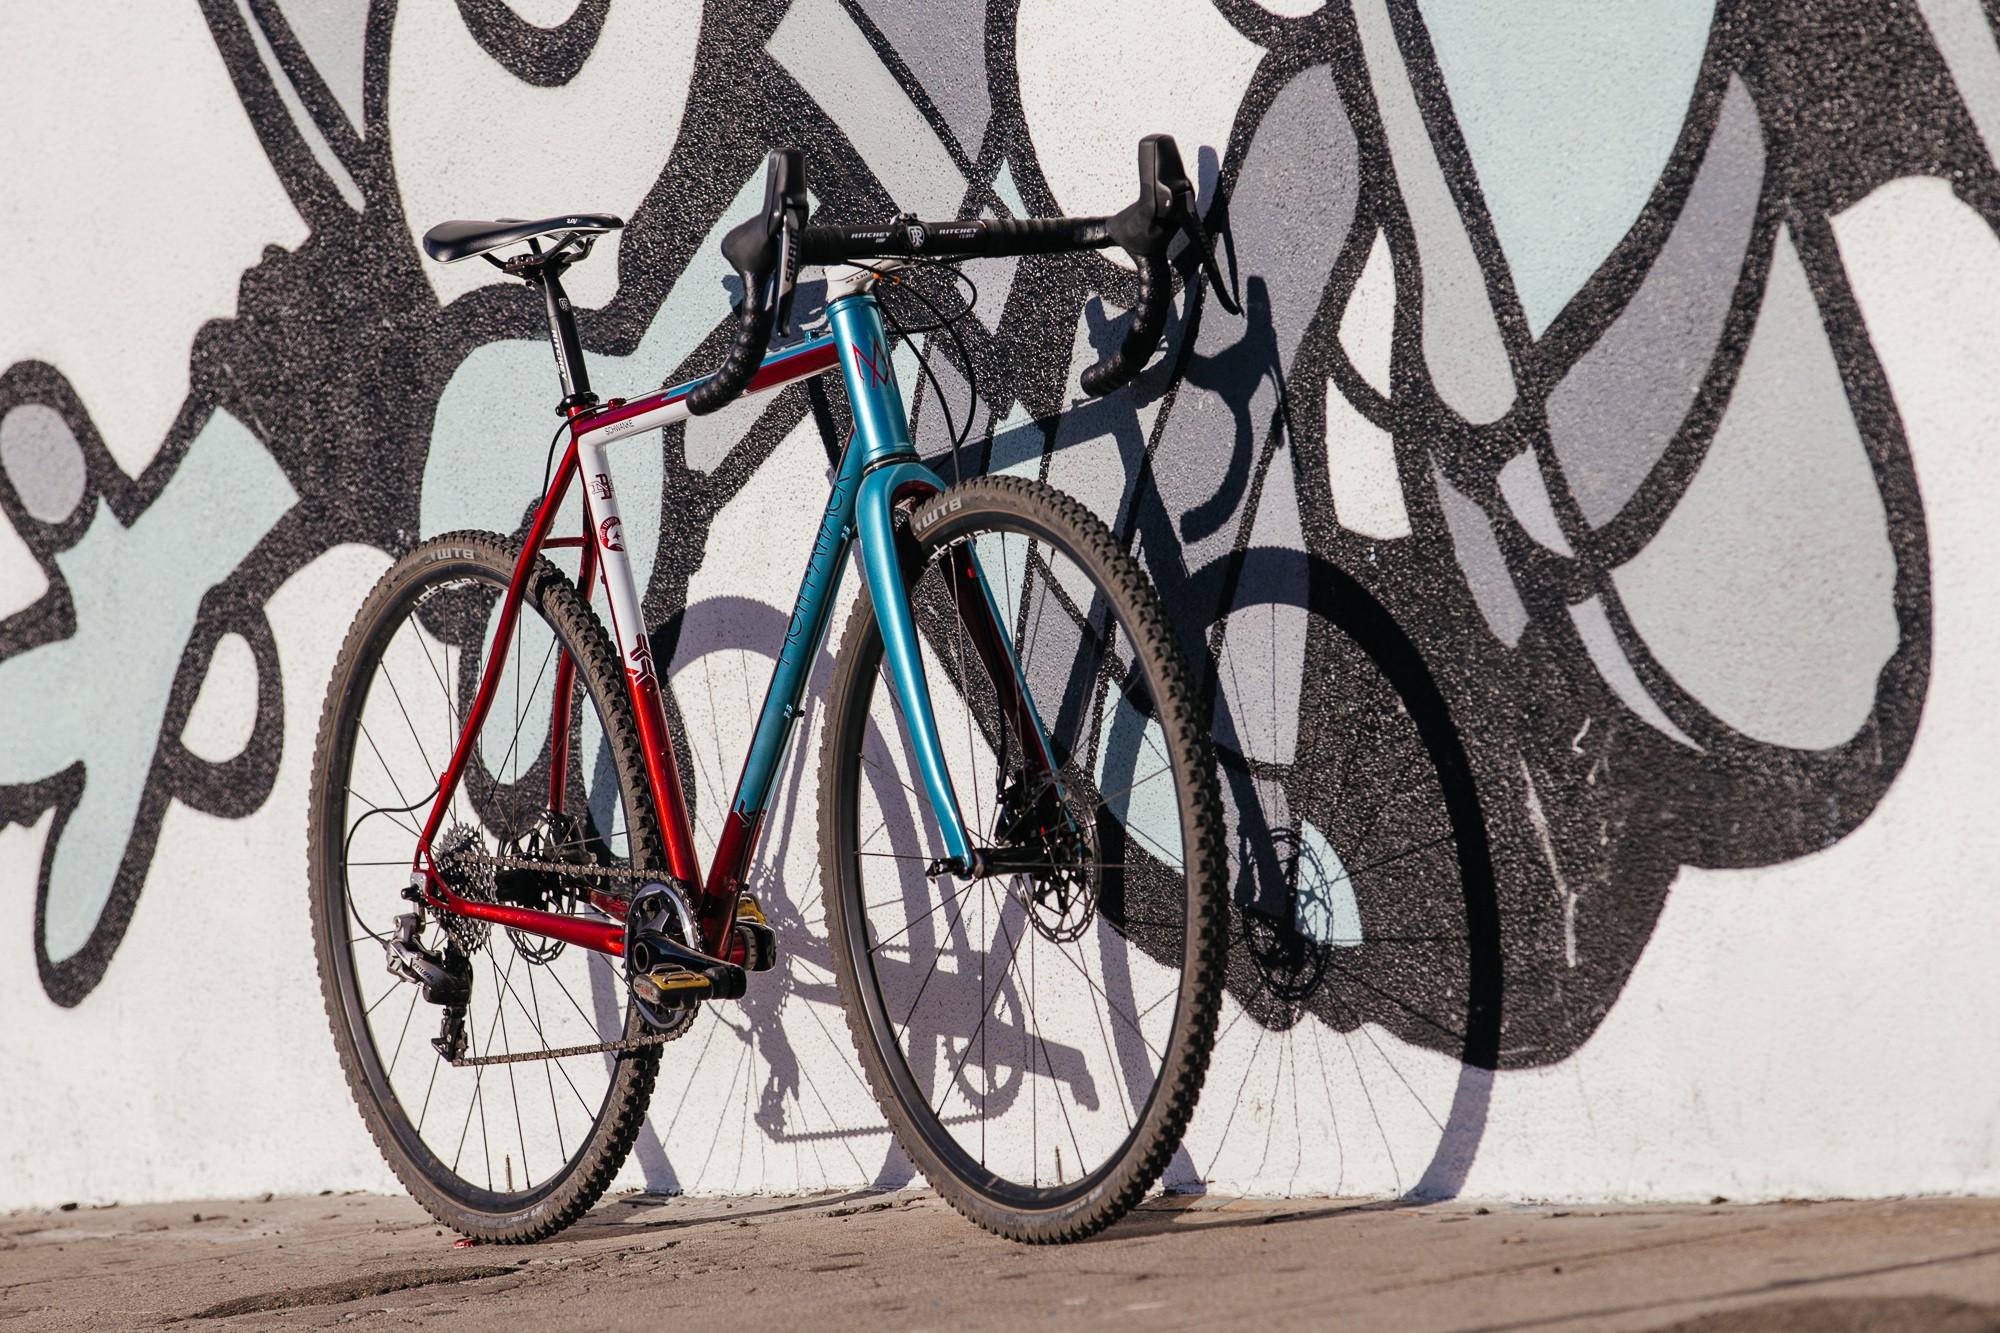 Ericas-Moth-Attack-CX-Team-Bike-19-1335x890@2x.jpg